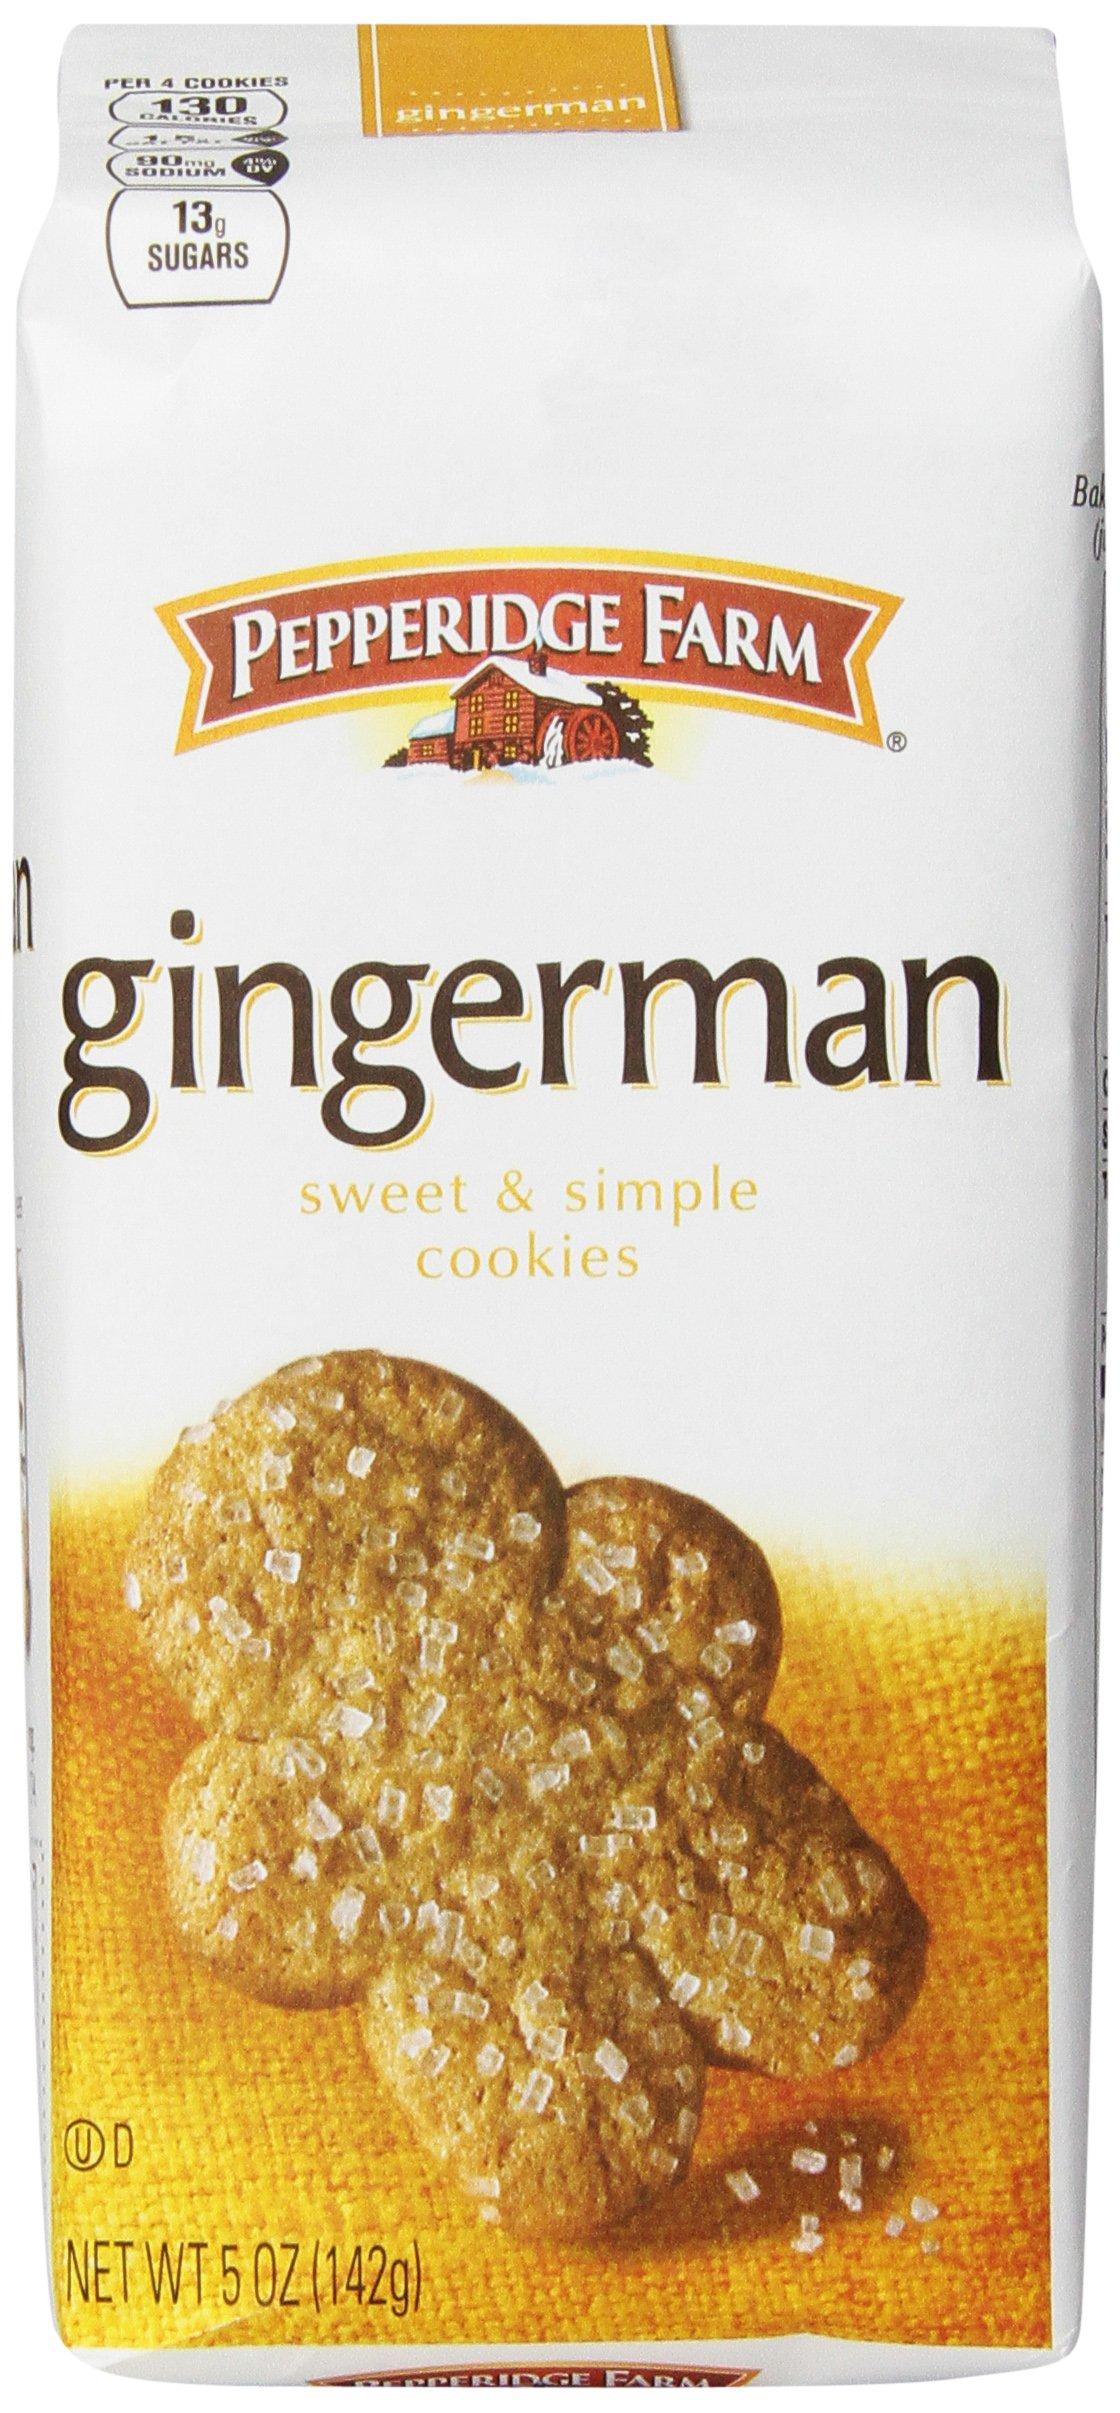 Pepperidge Farm Gingermen Cookies, 5 Ounce (Pack of 12)